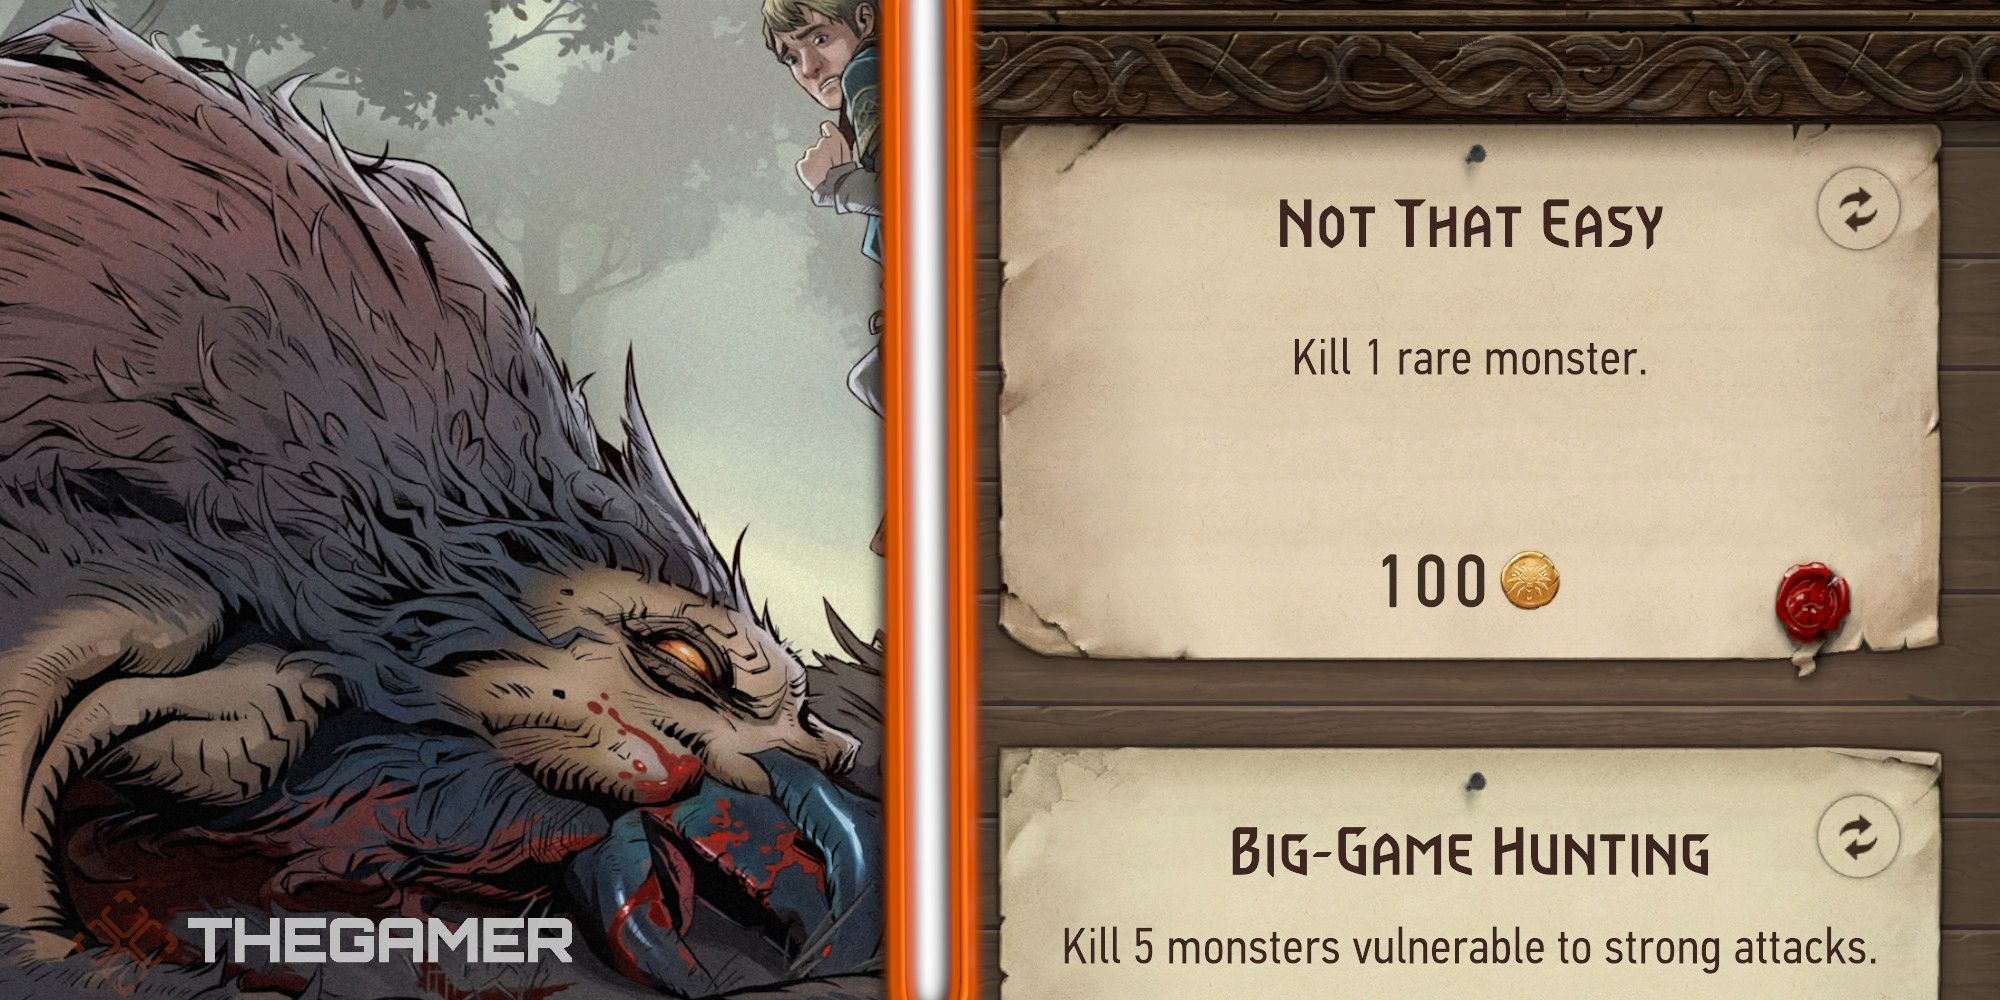 Cómo ganar monedas en The Witcher Monster Slayer